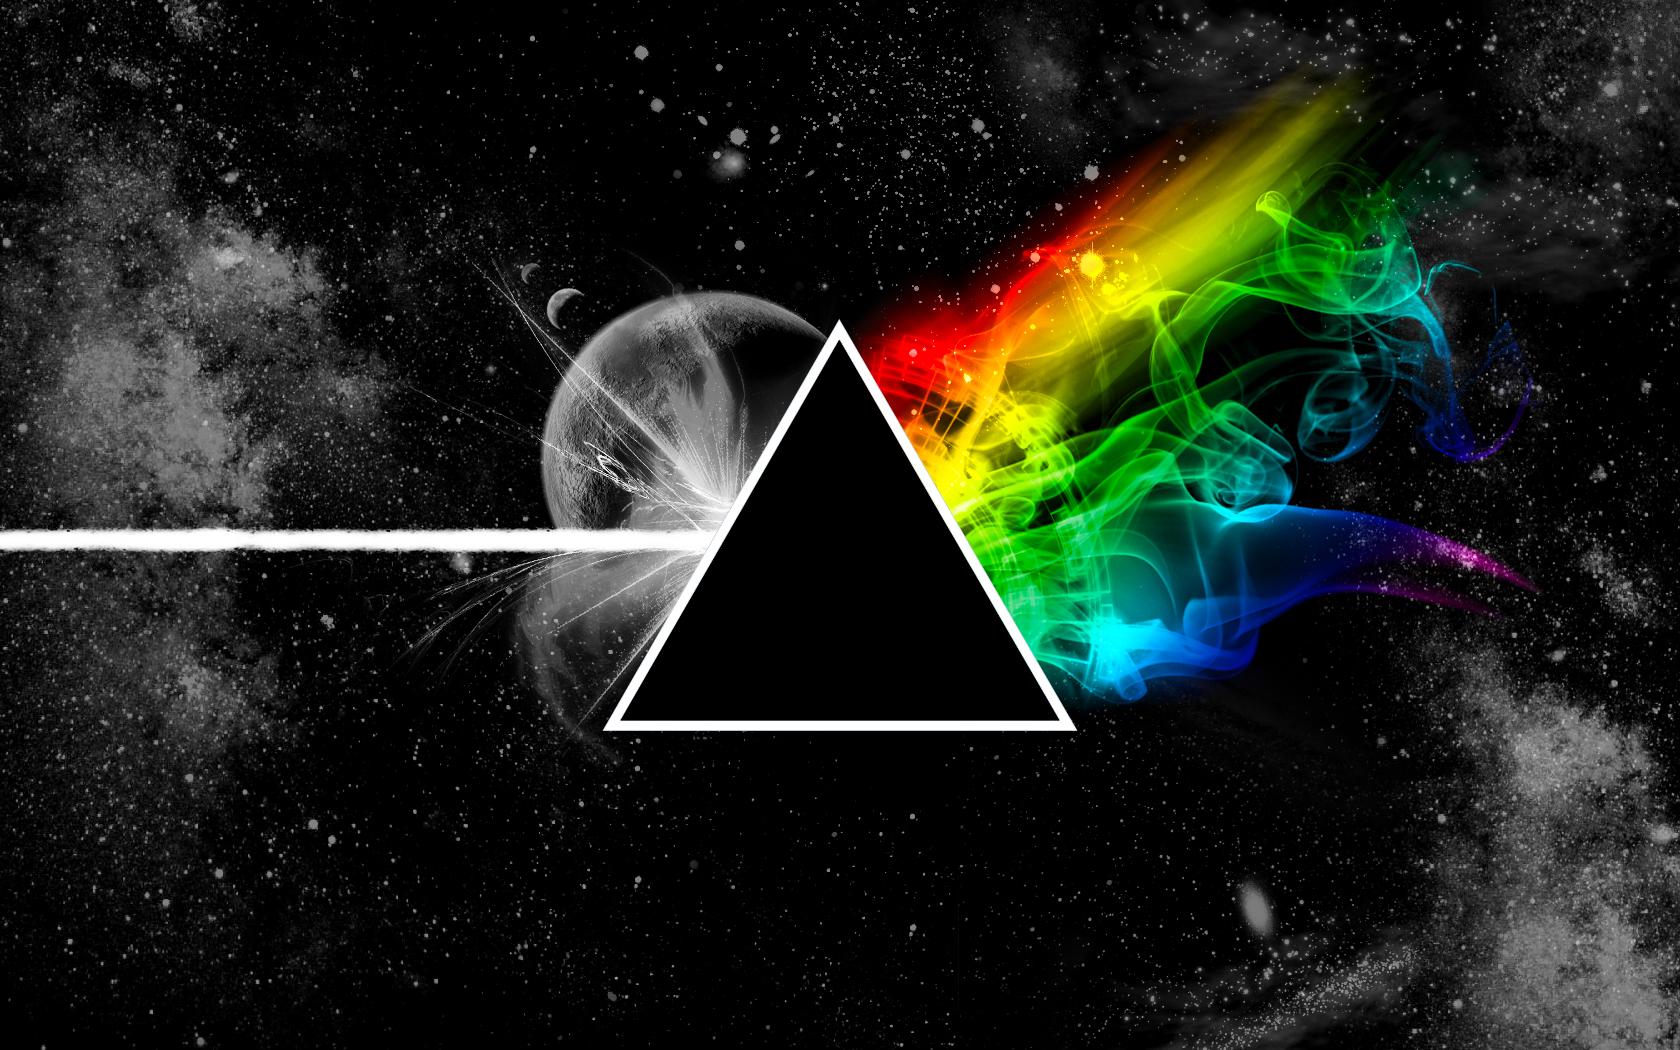 The Best Wallpaper Collection Pink Floyd Hd Wallpaper 1680x1050